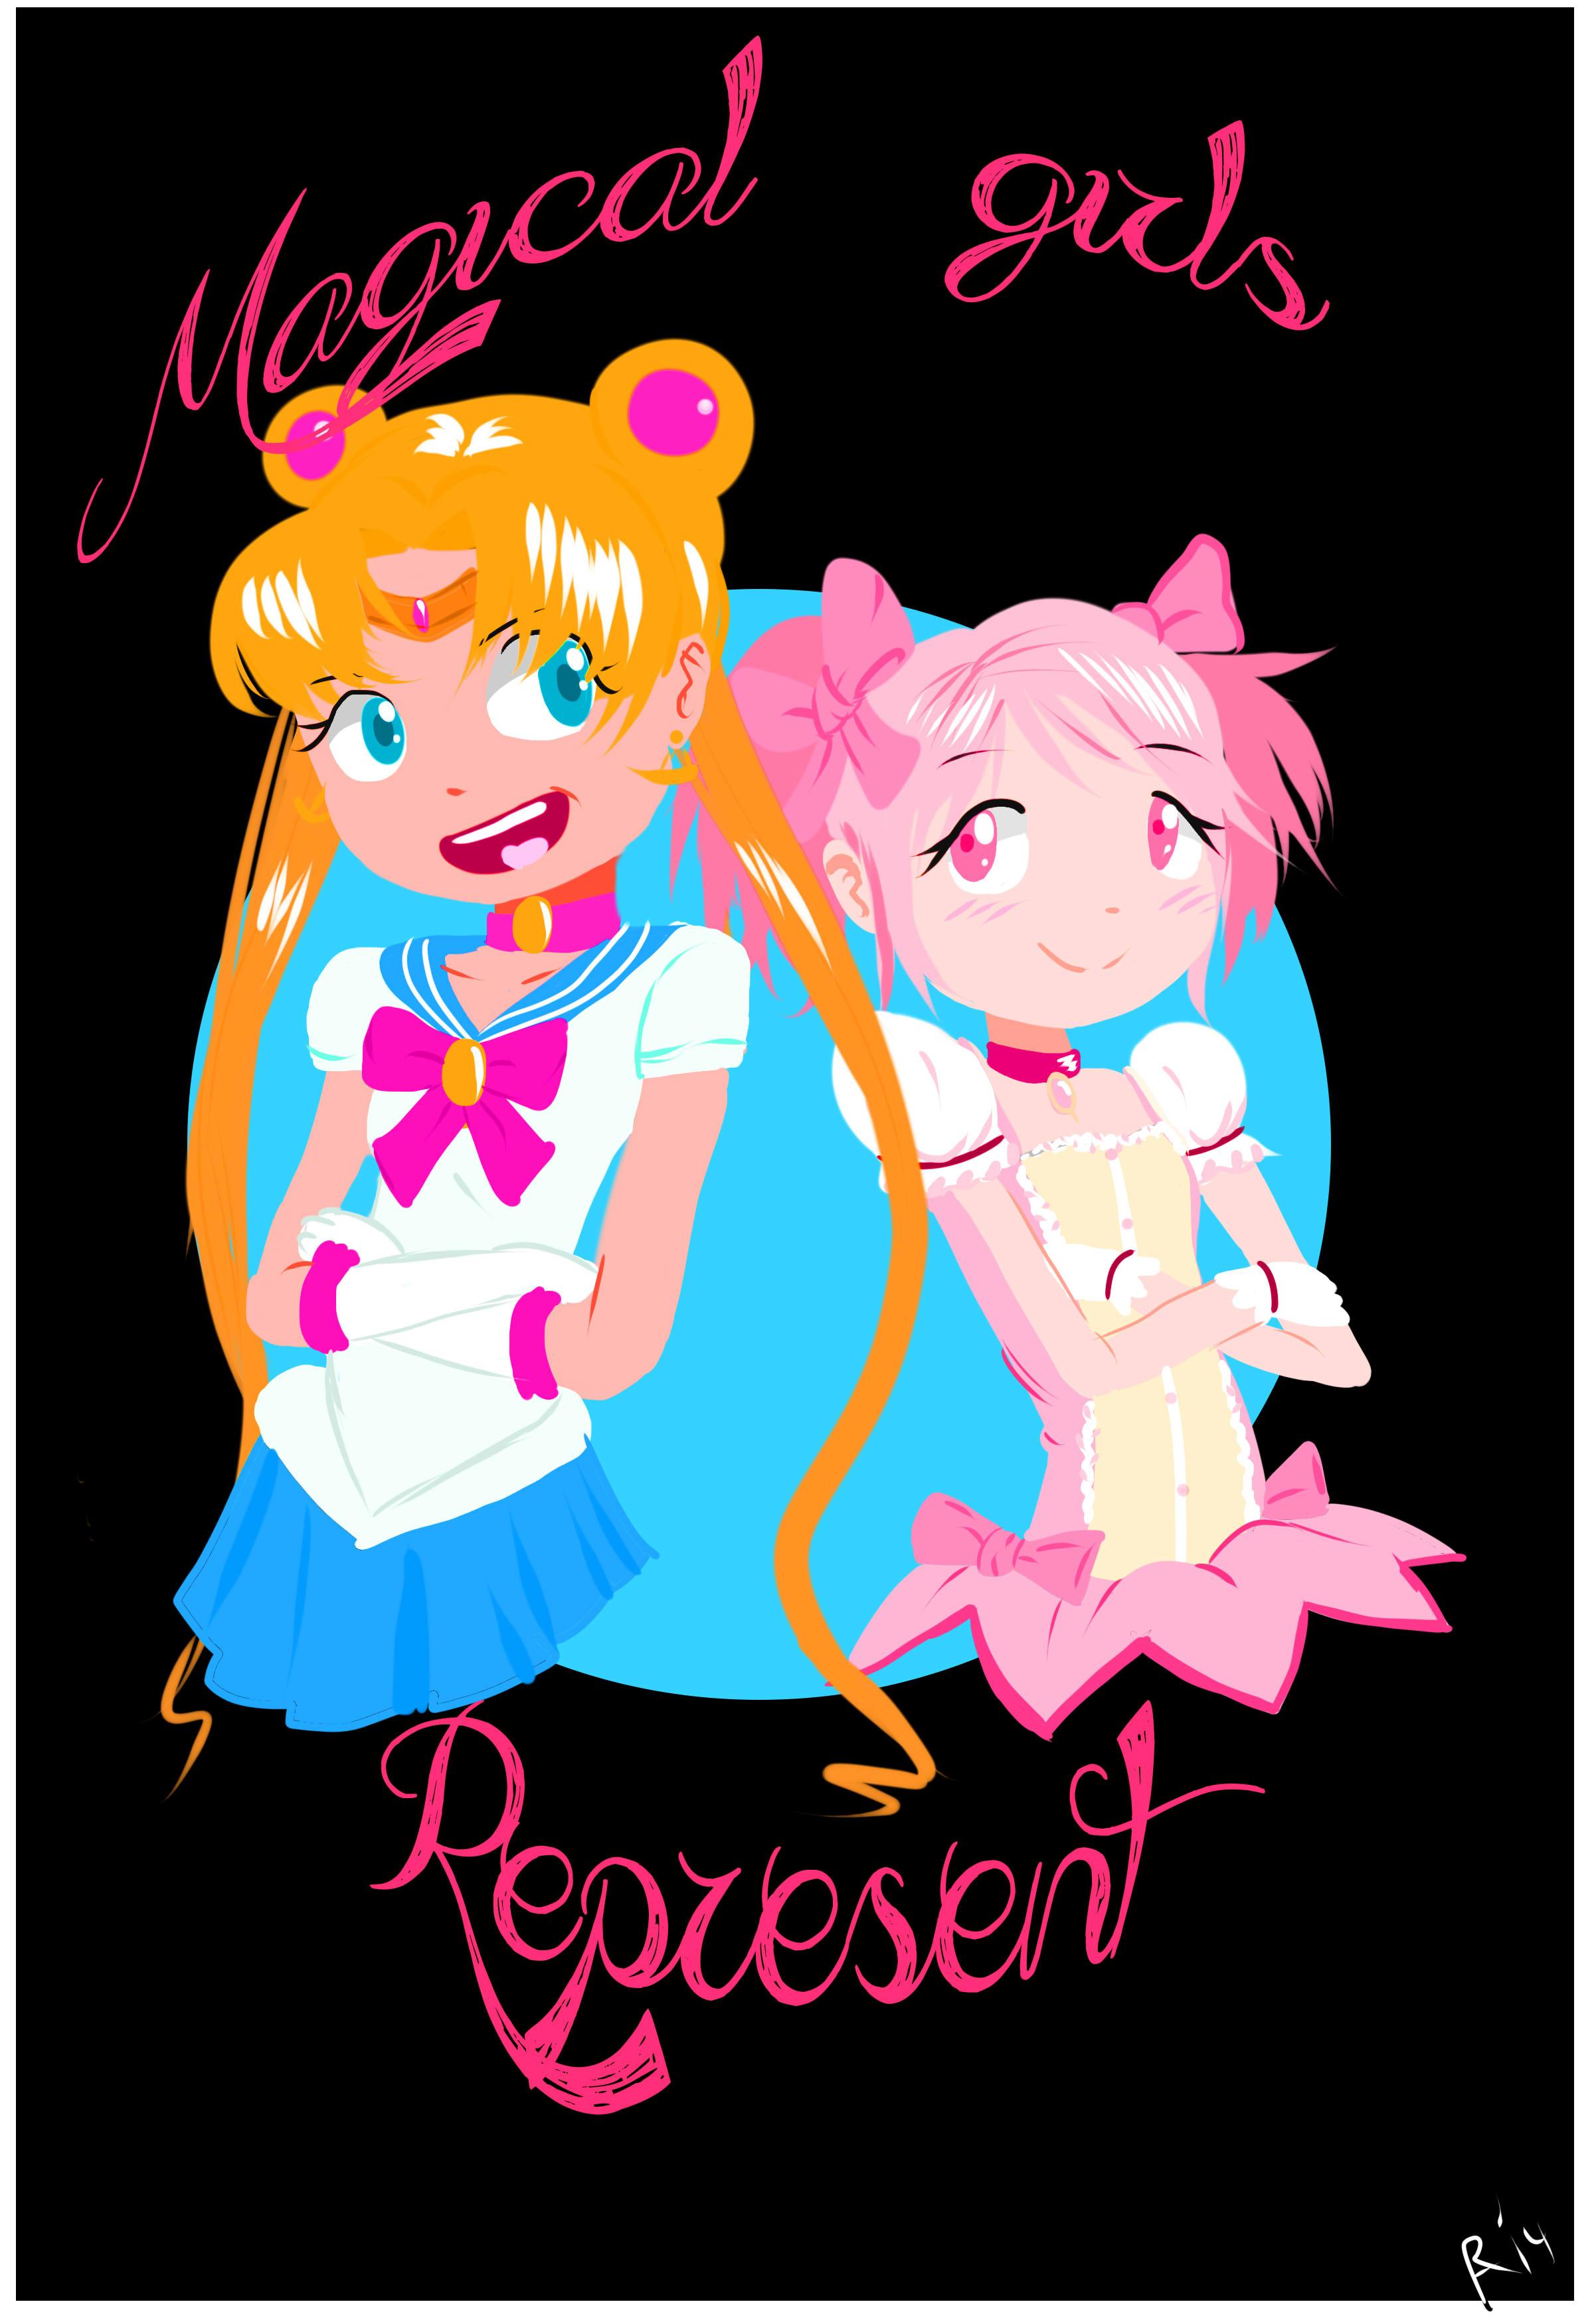 magical girls represent